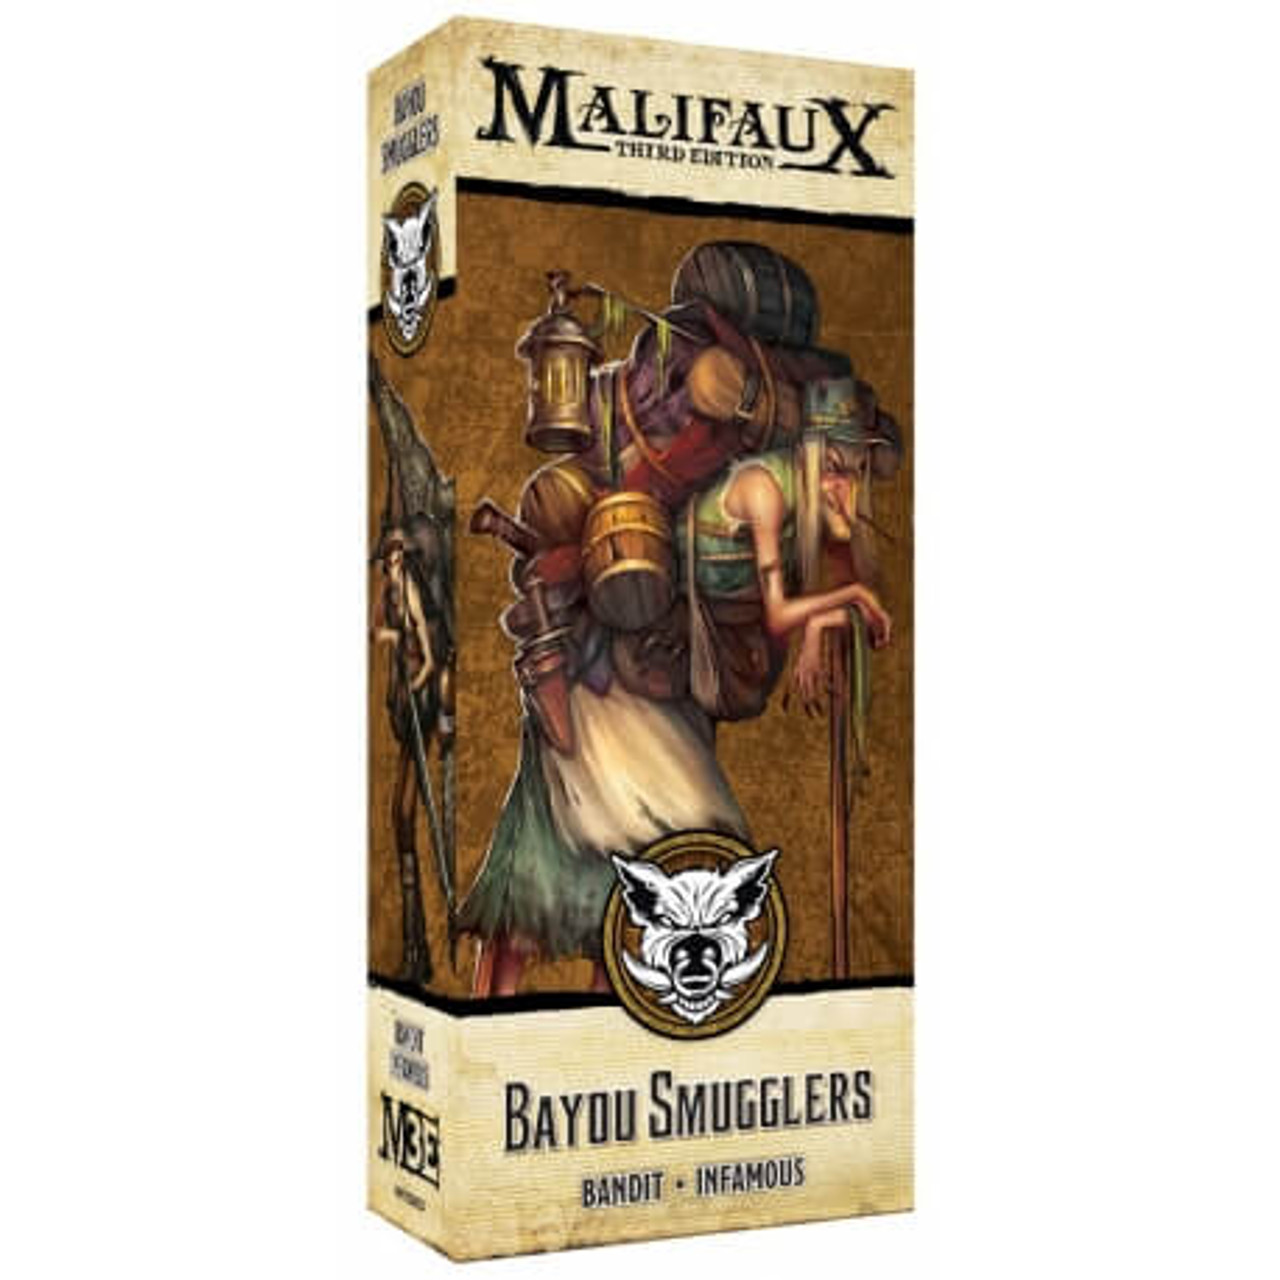 Malifaux Bayou Smugglers - Bayou - M3E